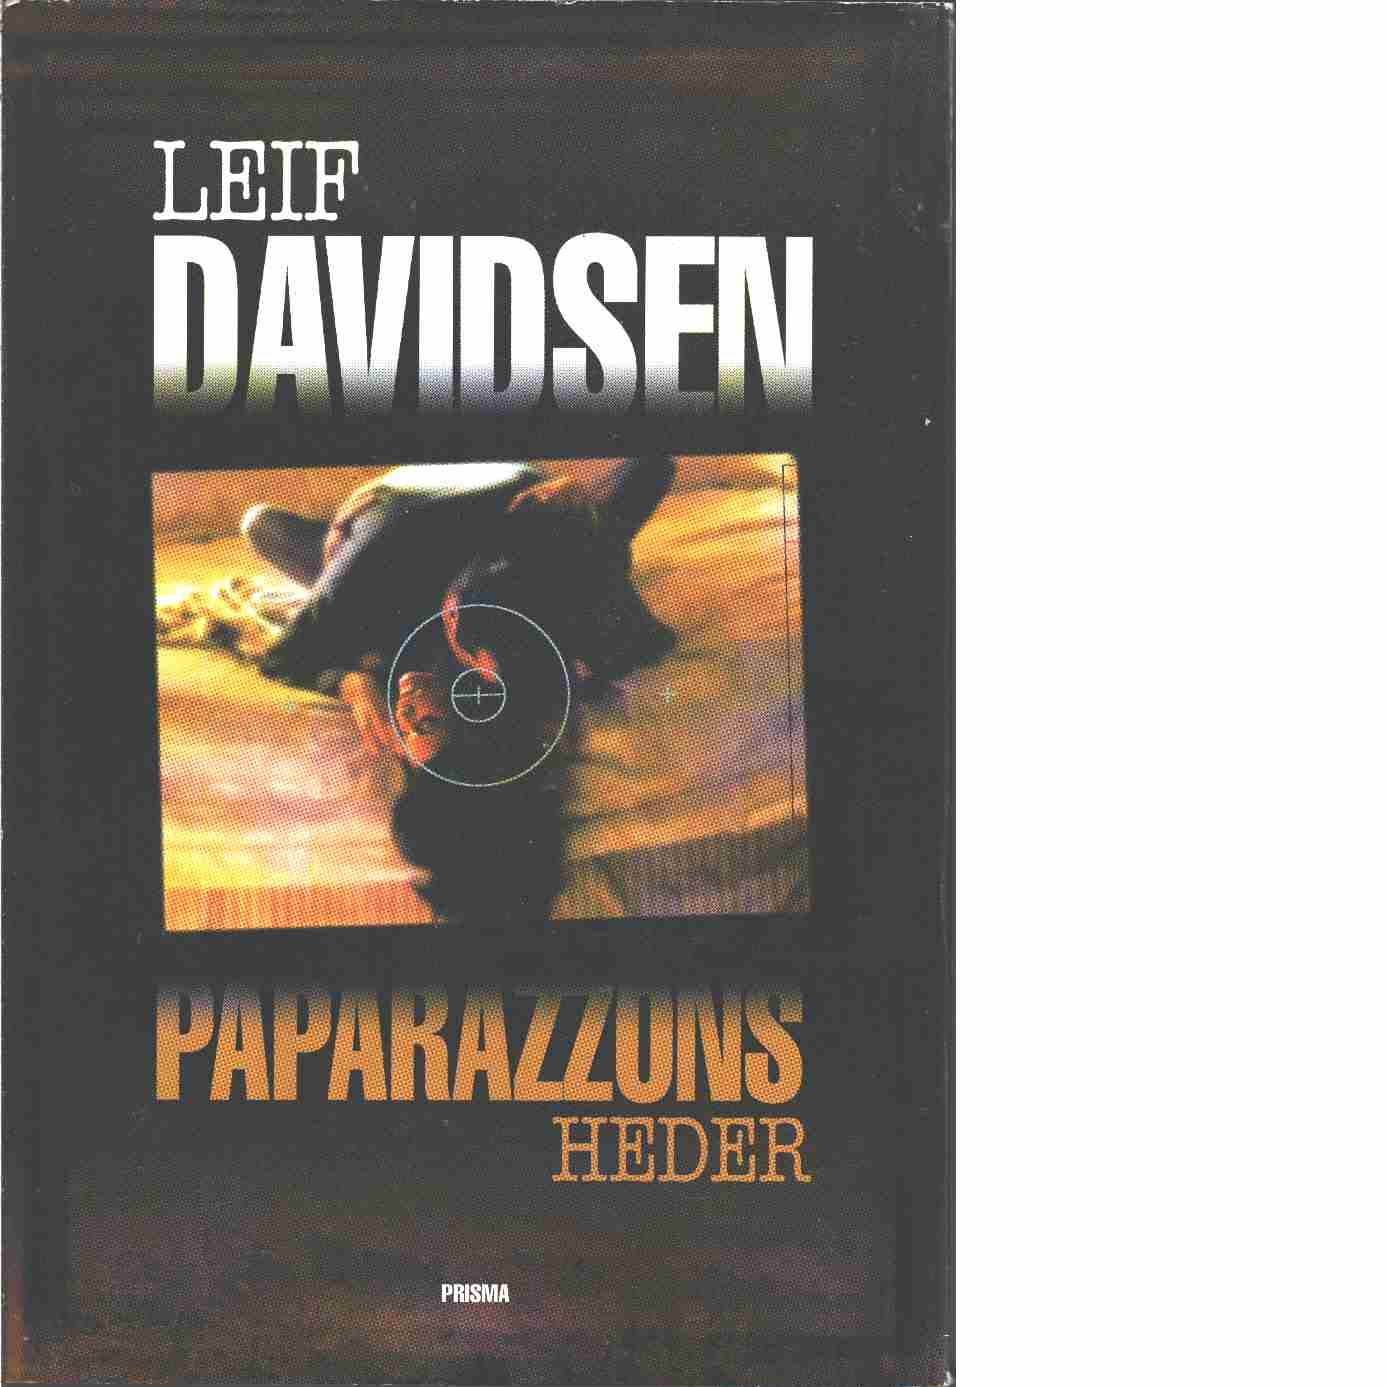 Paparazzons heder - Davidsen, Leif